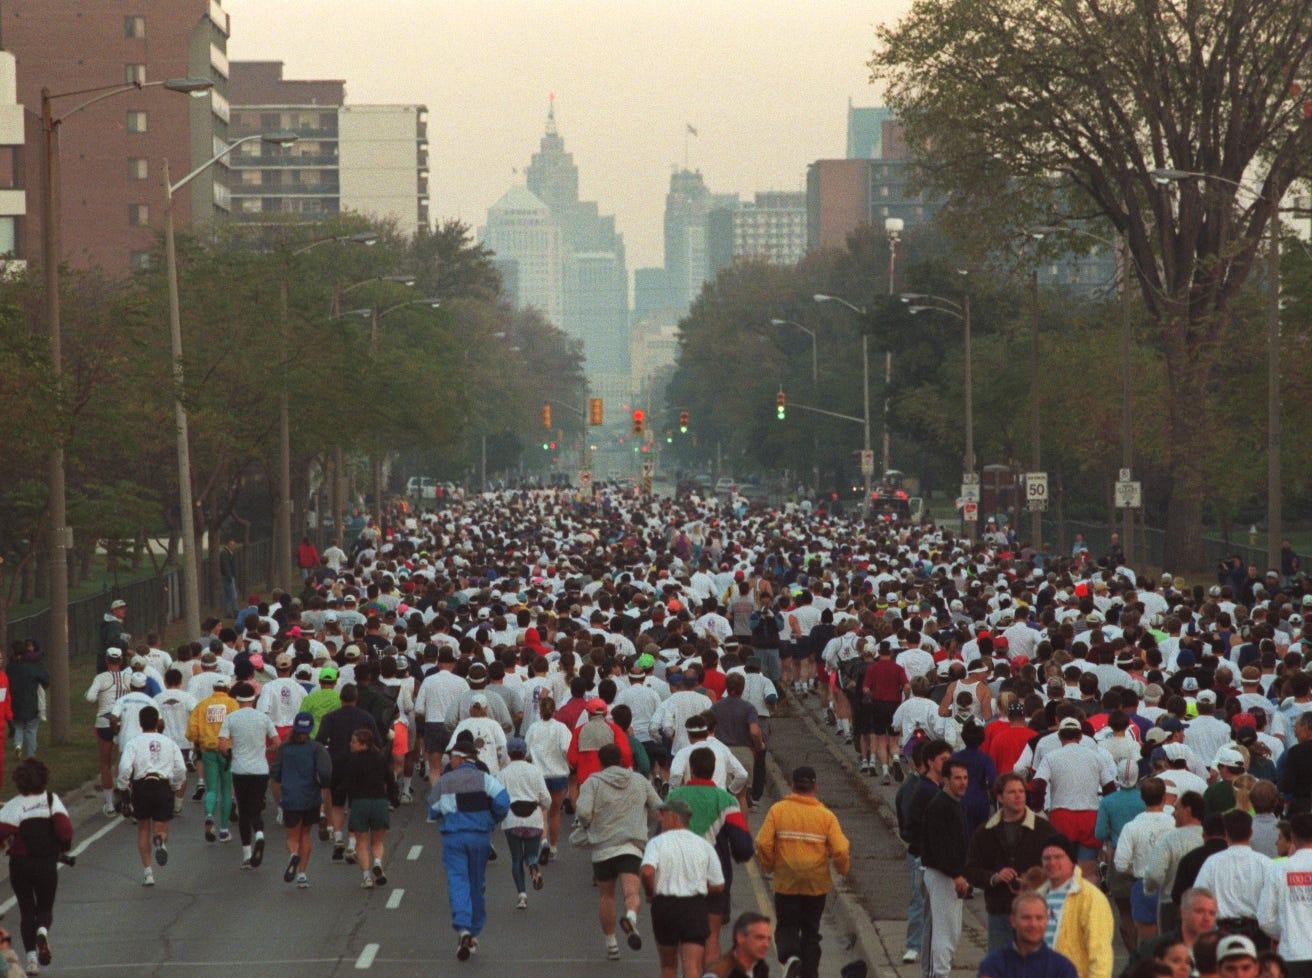 Start of the Free Press/Mazda marathon in Windsor, running towards Detroit in 1997.